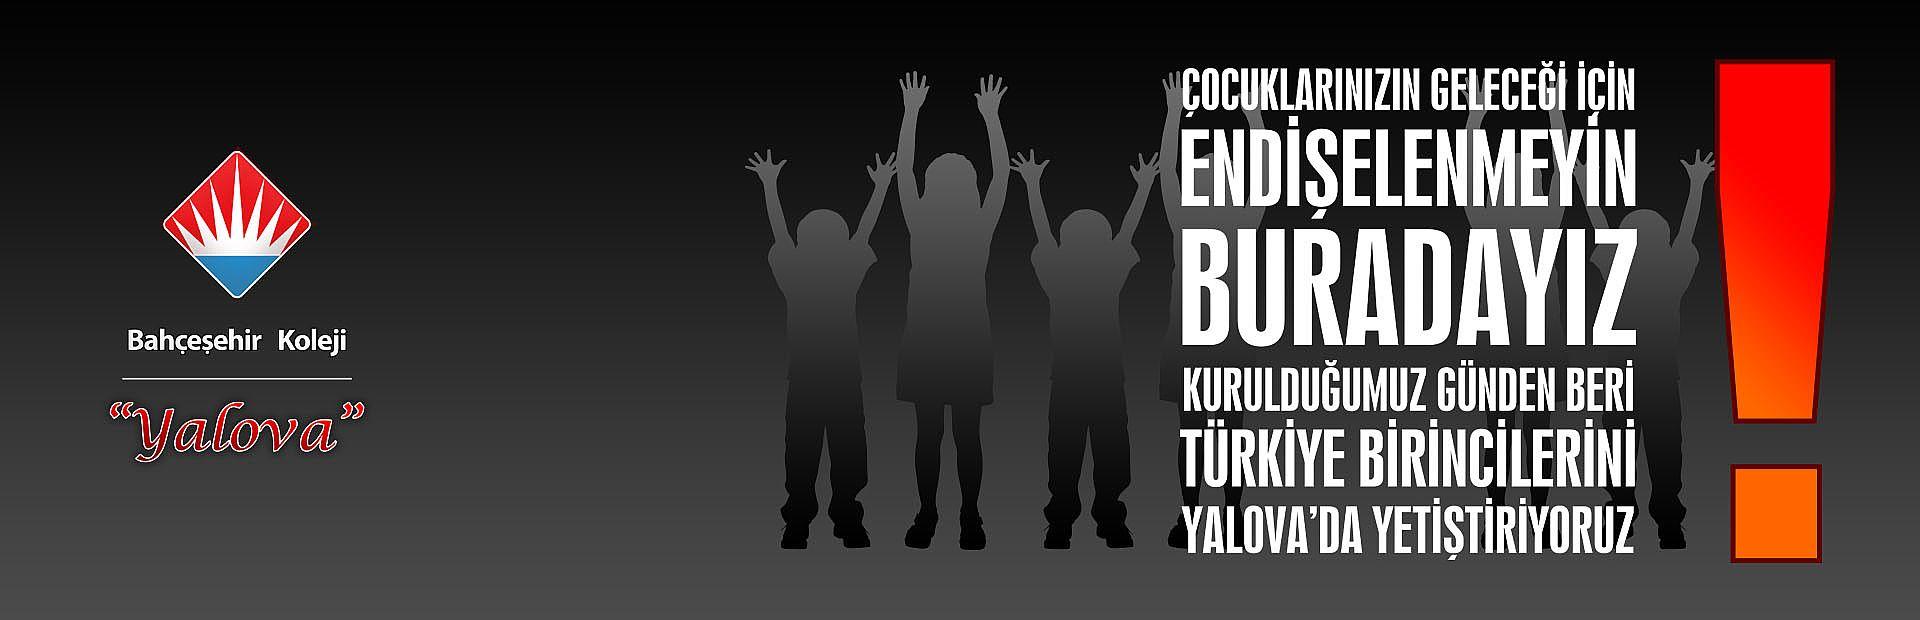 Bahçeşehir Koleji yalovabahcesehir.com